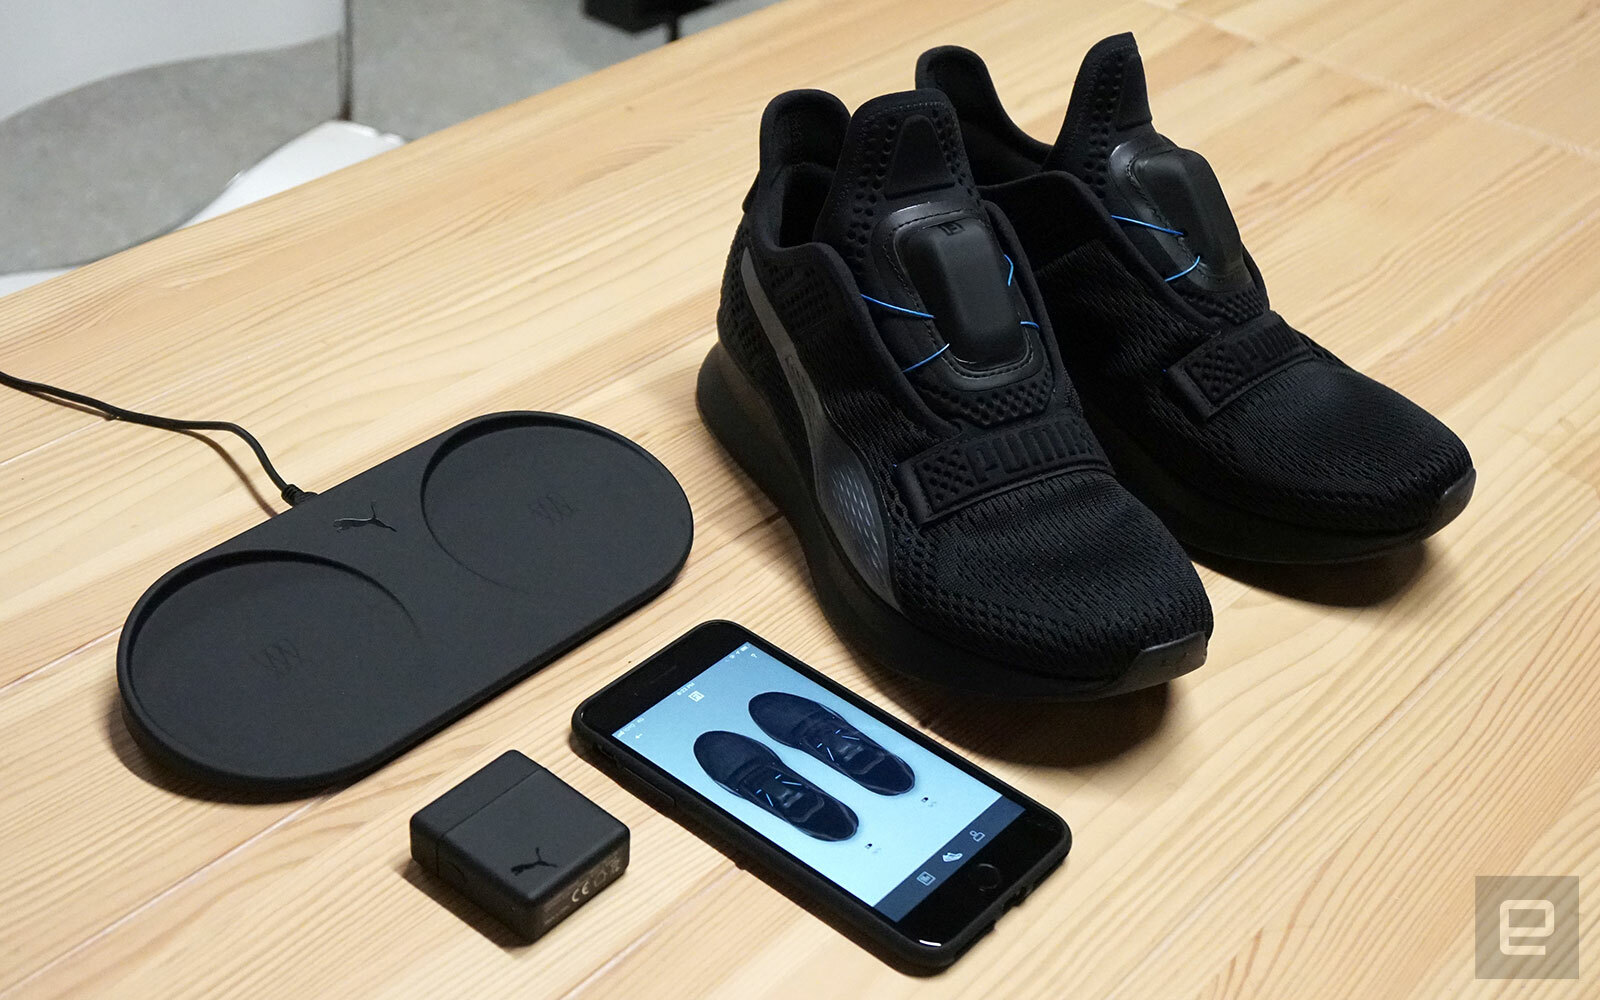 acc8641b2626a6 Puma New Fi Self-Lacing Shoes - FunkyKit